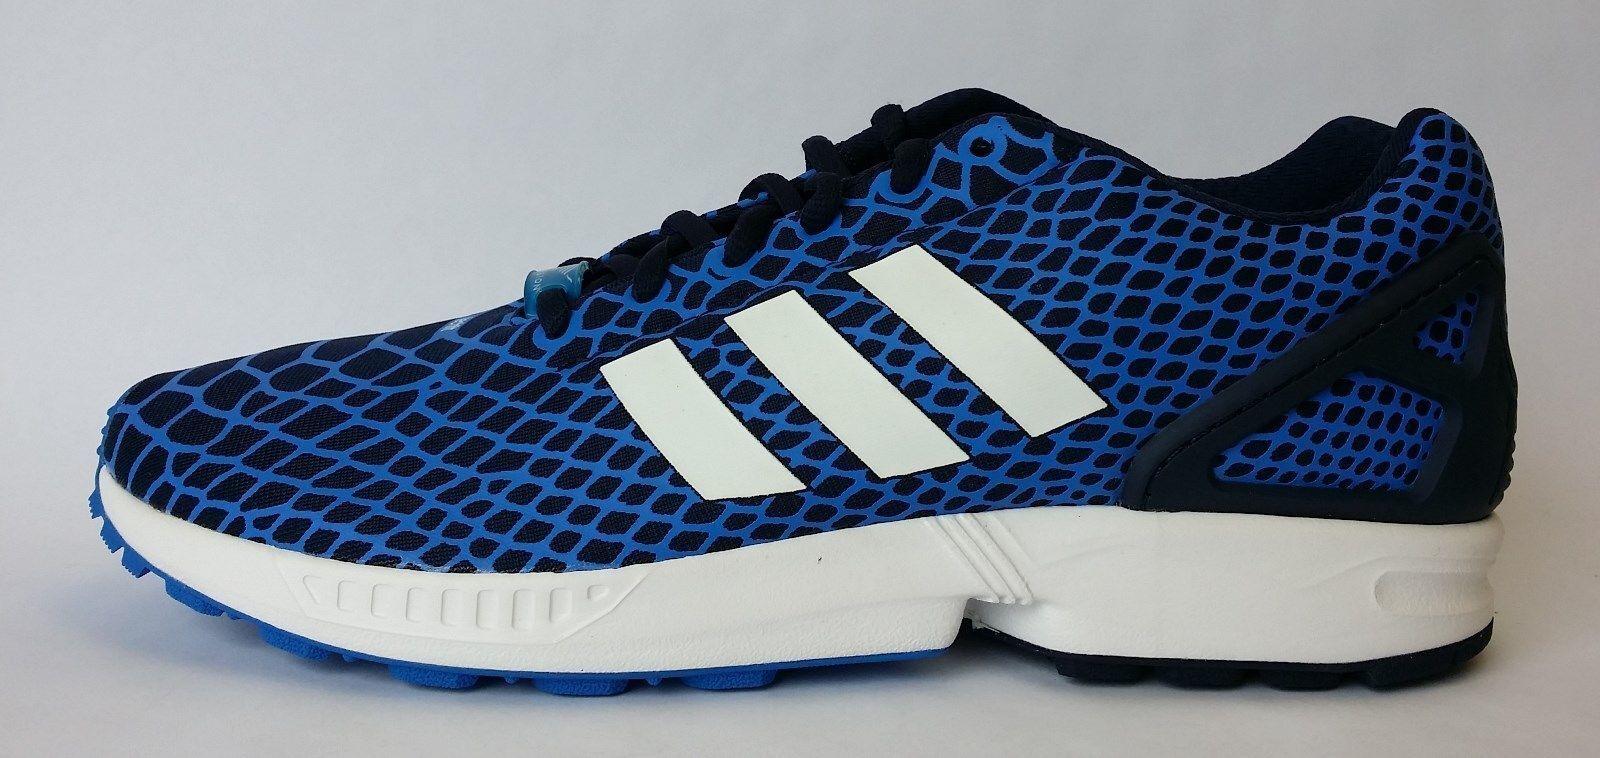 Adidas ORIGINALS ZX FLUX TECHFIT Men's Shoes B24932 a1 Cheap and beautiful fashion